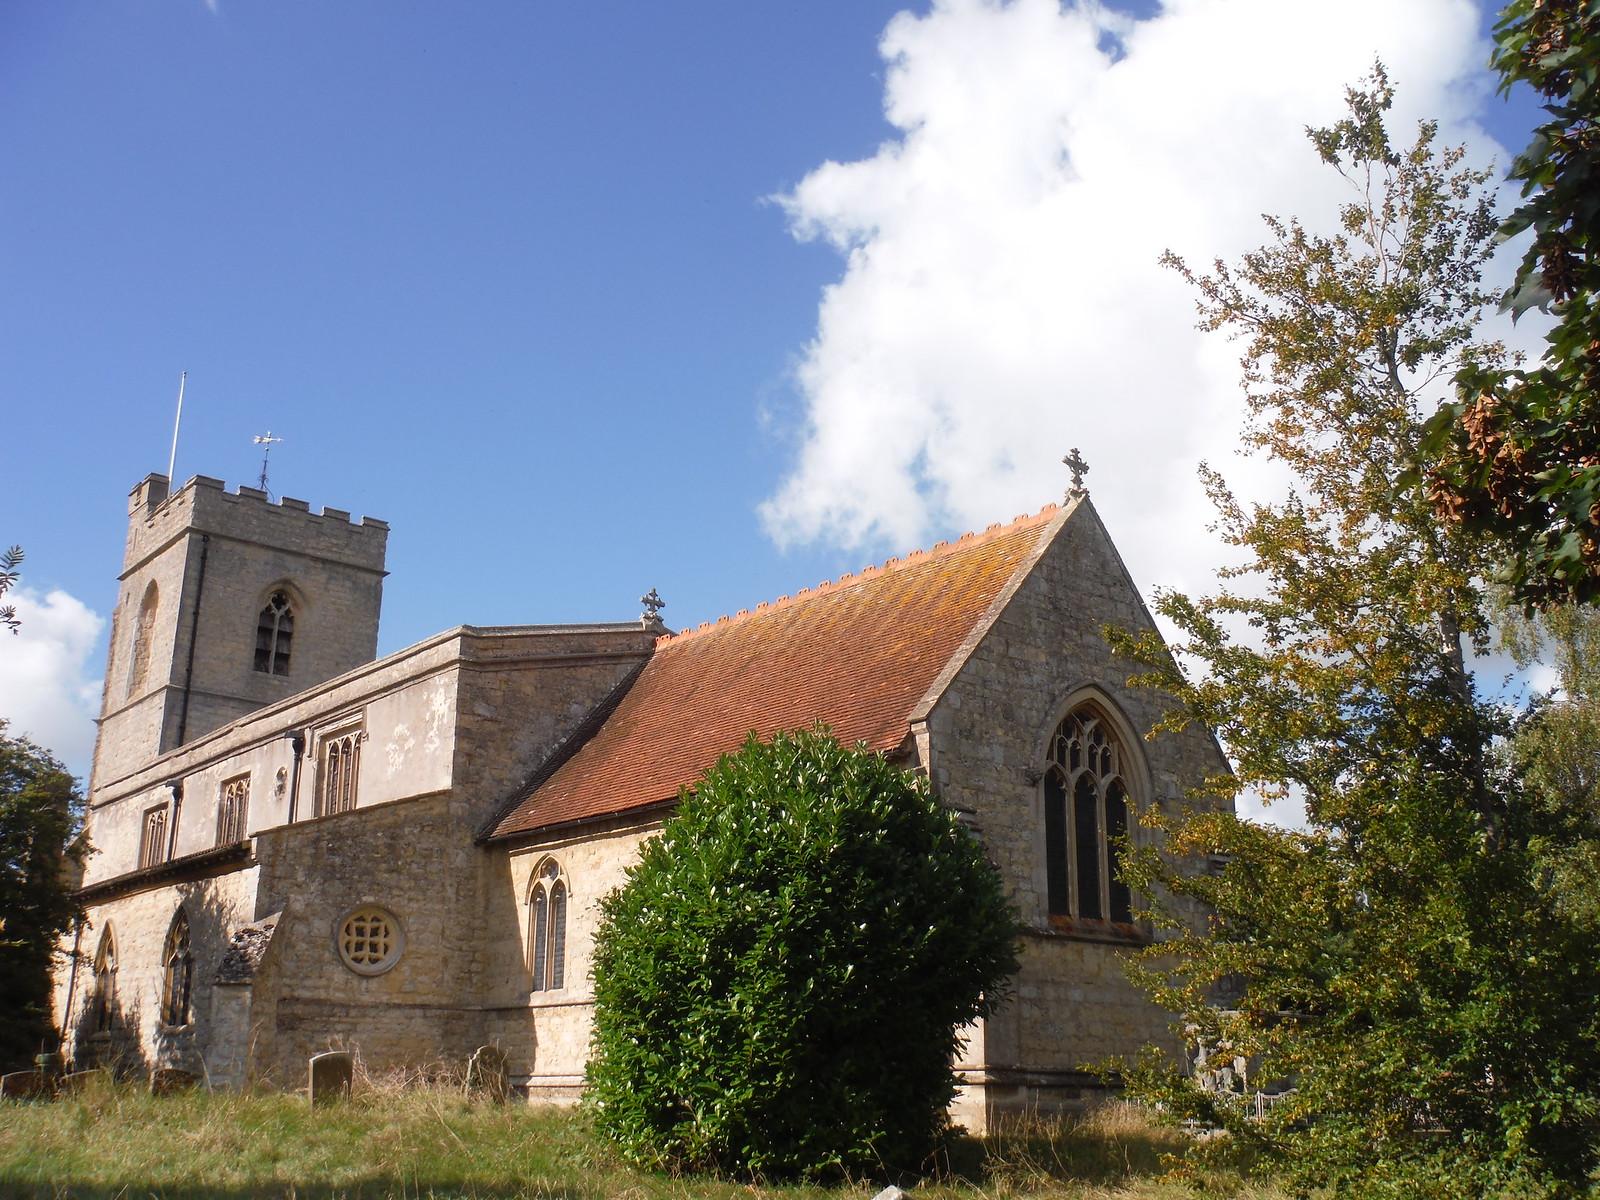 St. Mary the Virgin, Hardwick with Weedon SWC Walk 194 Aylesbury Vale Parkway to Aylesbury